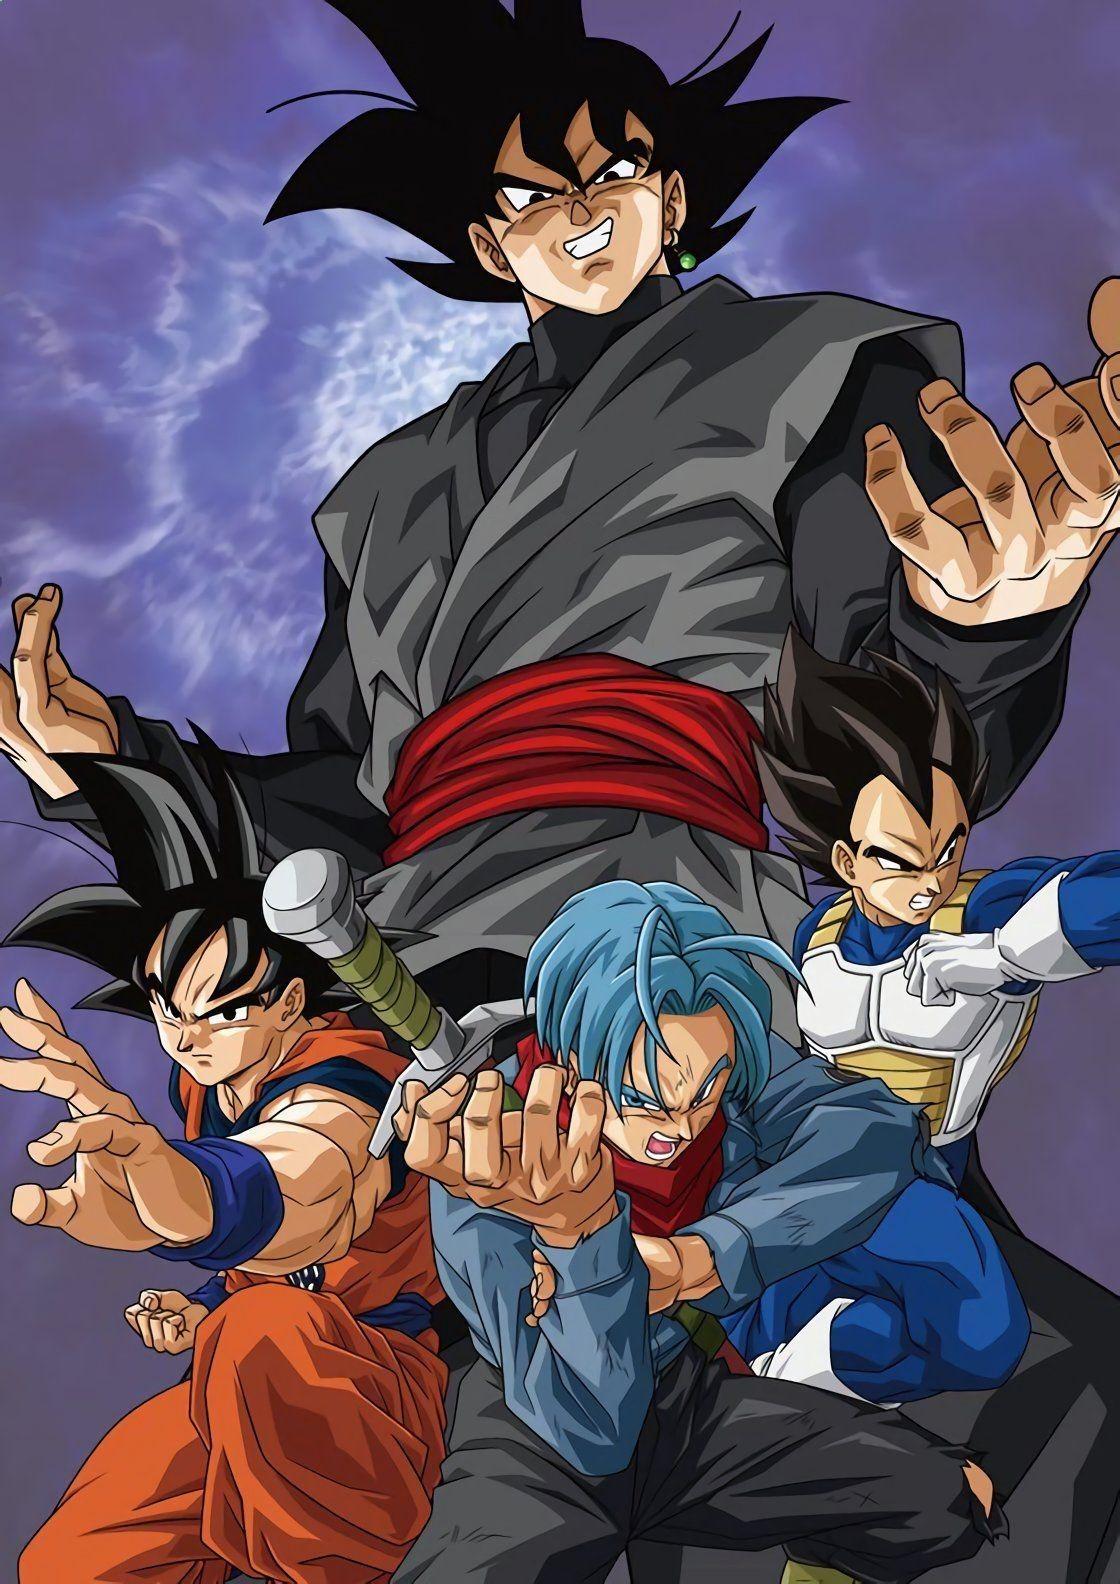 Black goku vs goku trunks and vegeta 2018 animes - Dbz goku vegeta ...